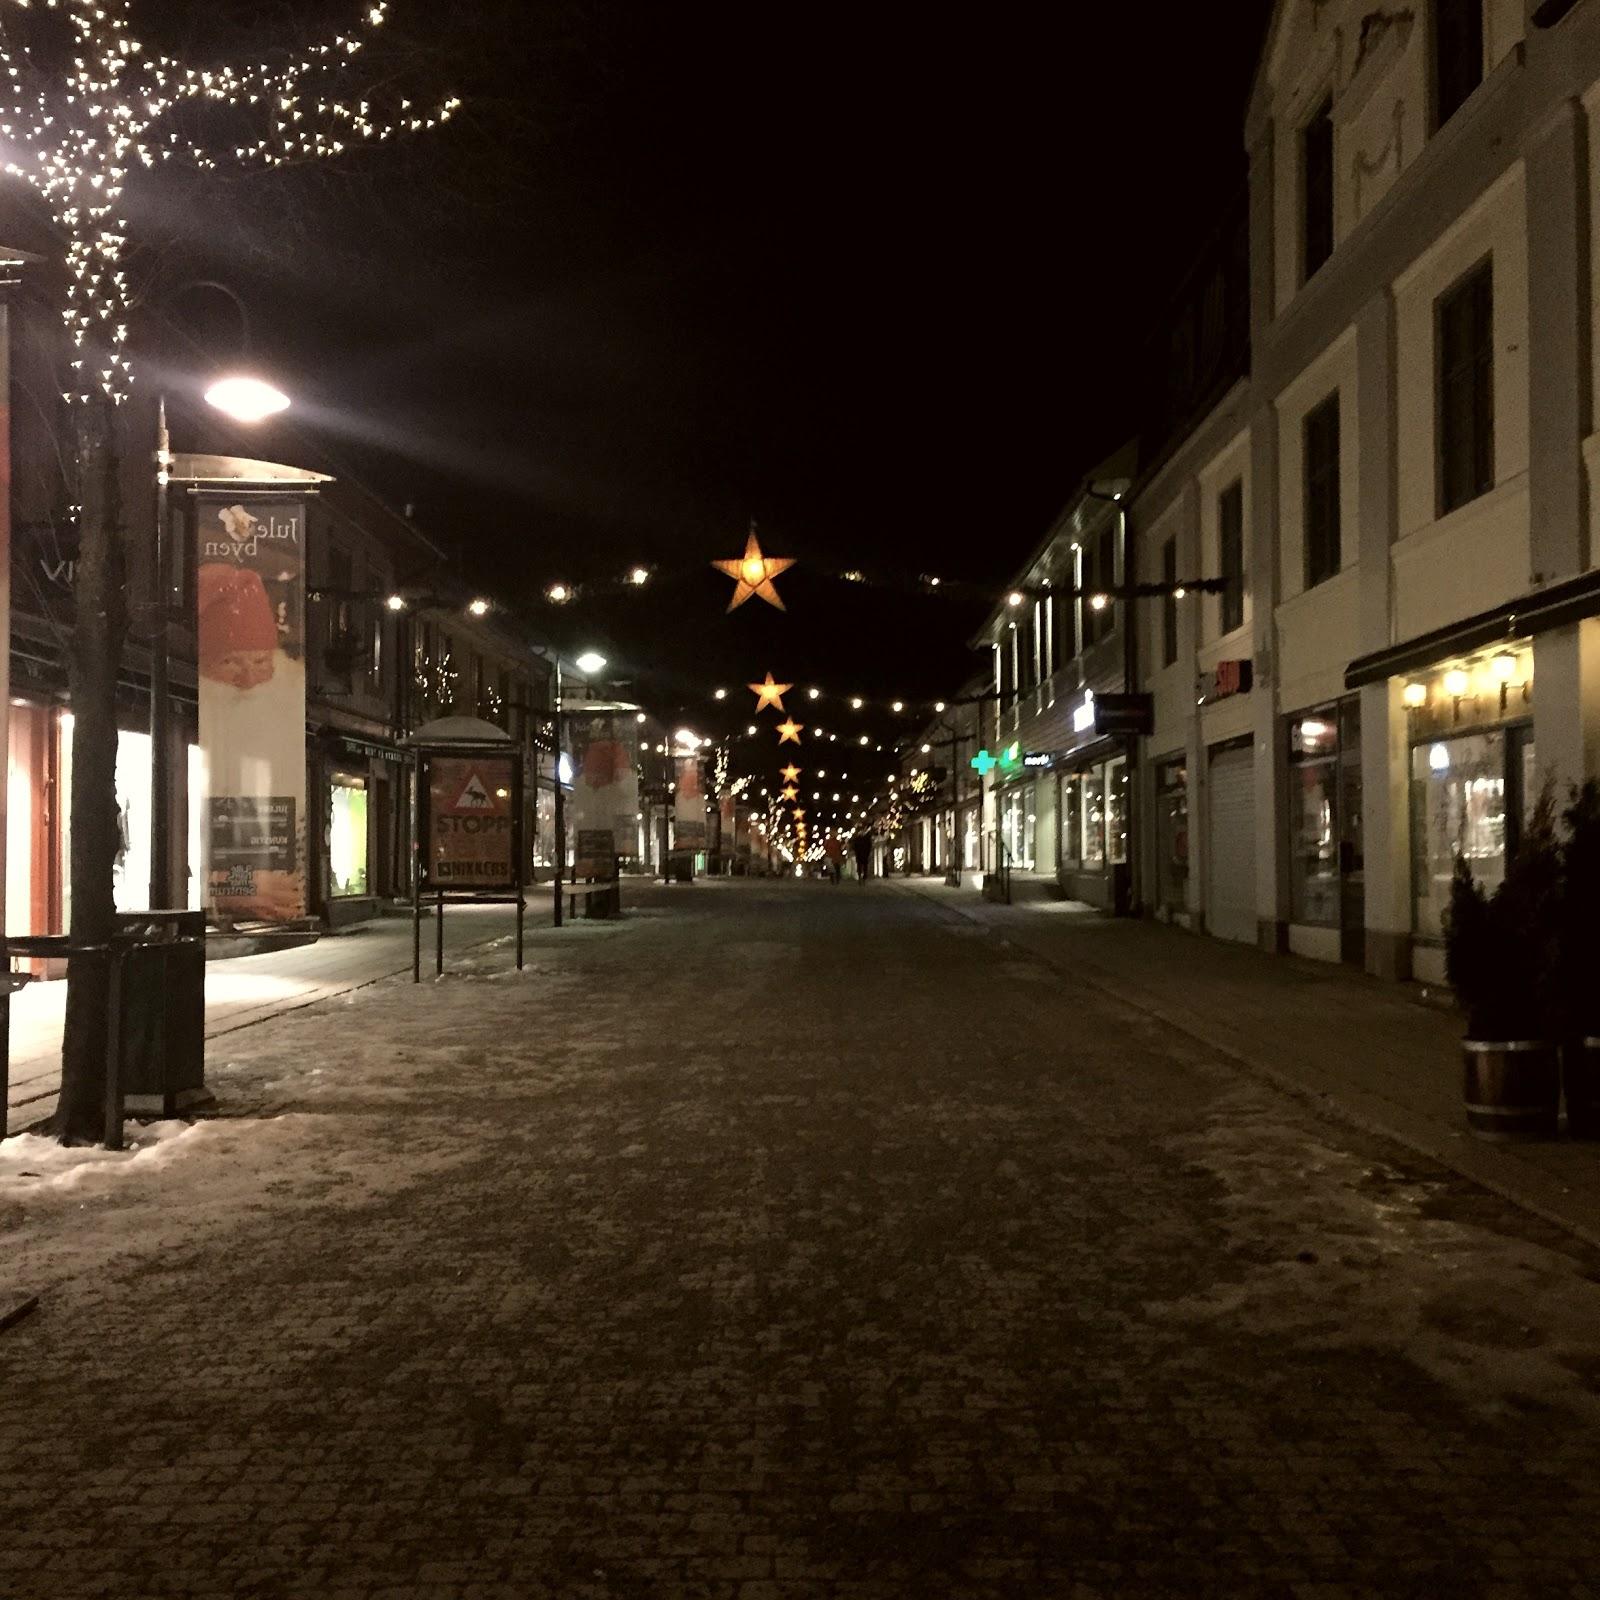 lillehammer na noruega no inverno